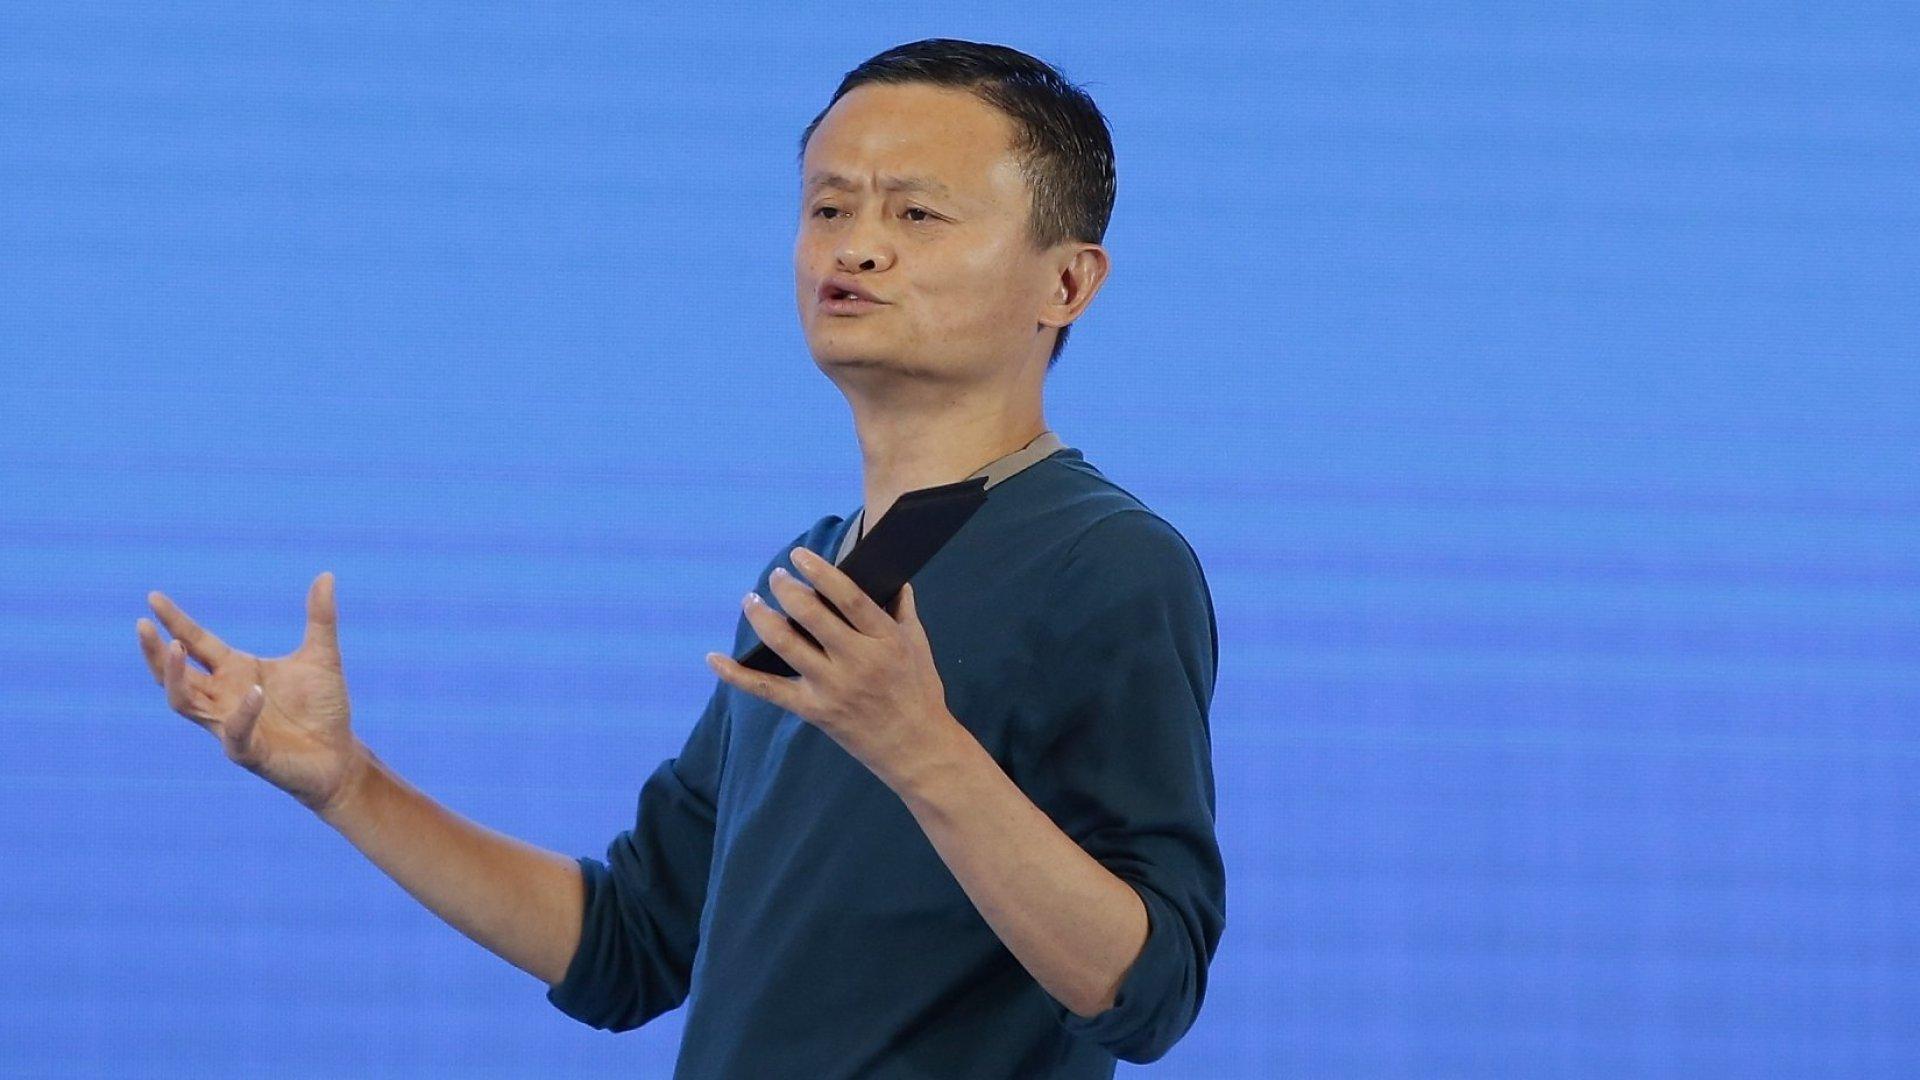 Jack Ma, Executive Chairman of Alibaba Group, speaks during the 2017 China International Big Data Industry Expo at Guiyang International Eco-Conference Center on May 26, 2017 in Guiyang, China.